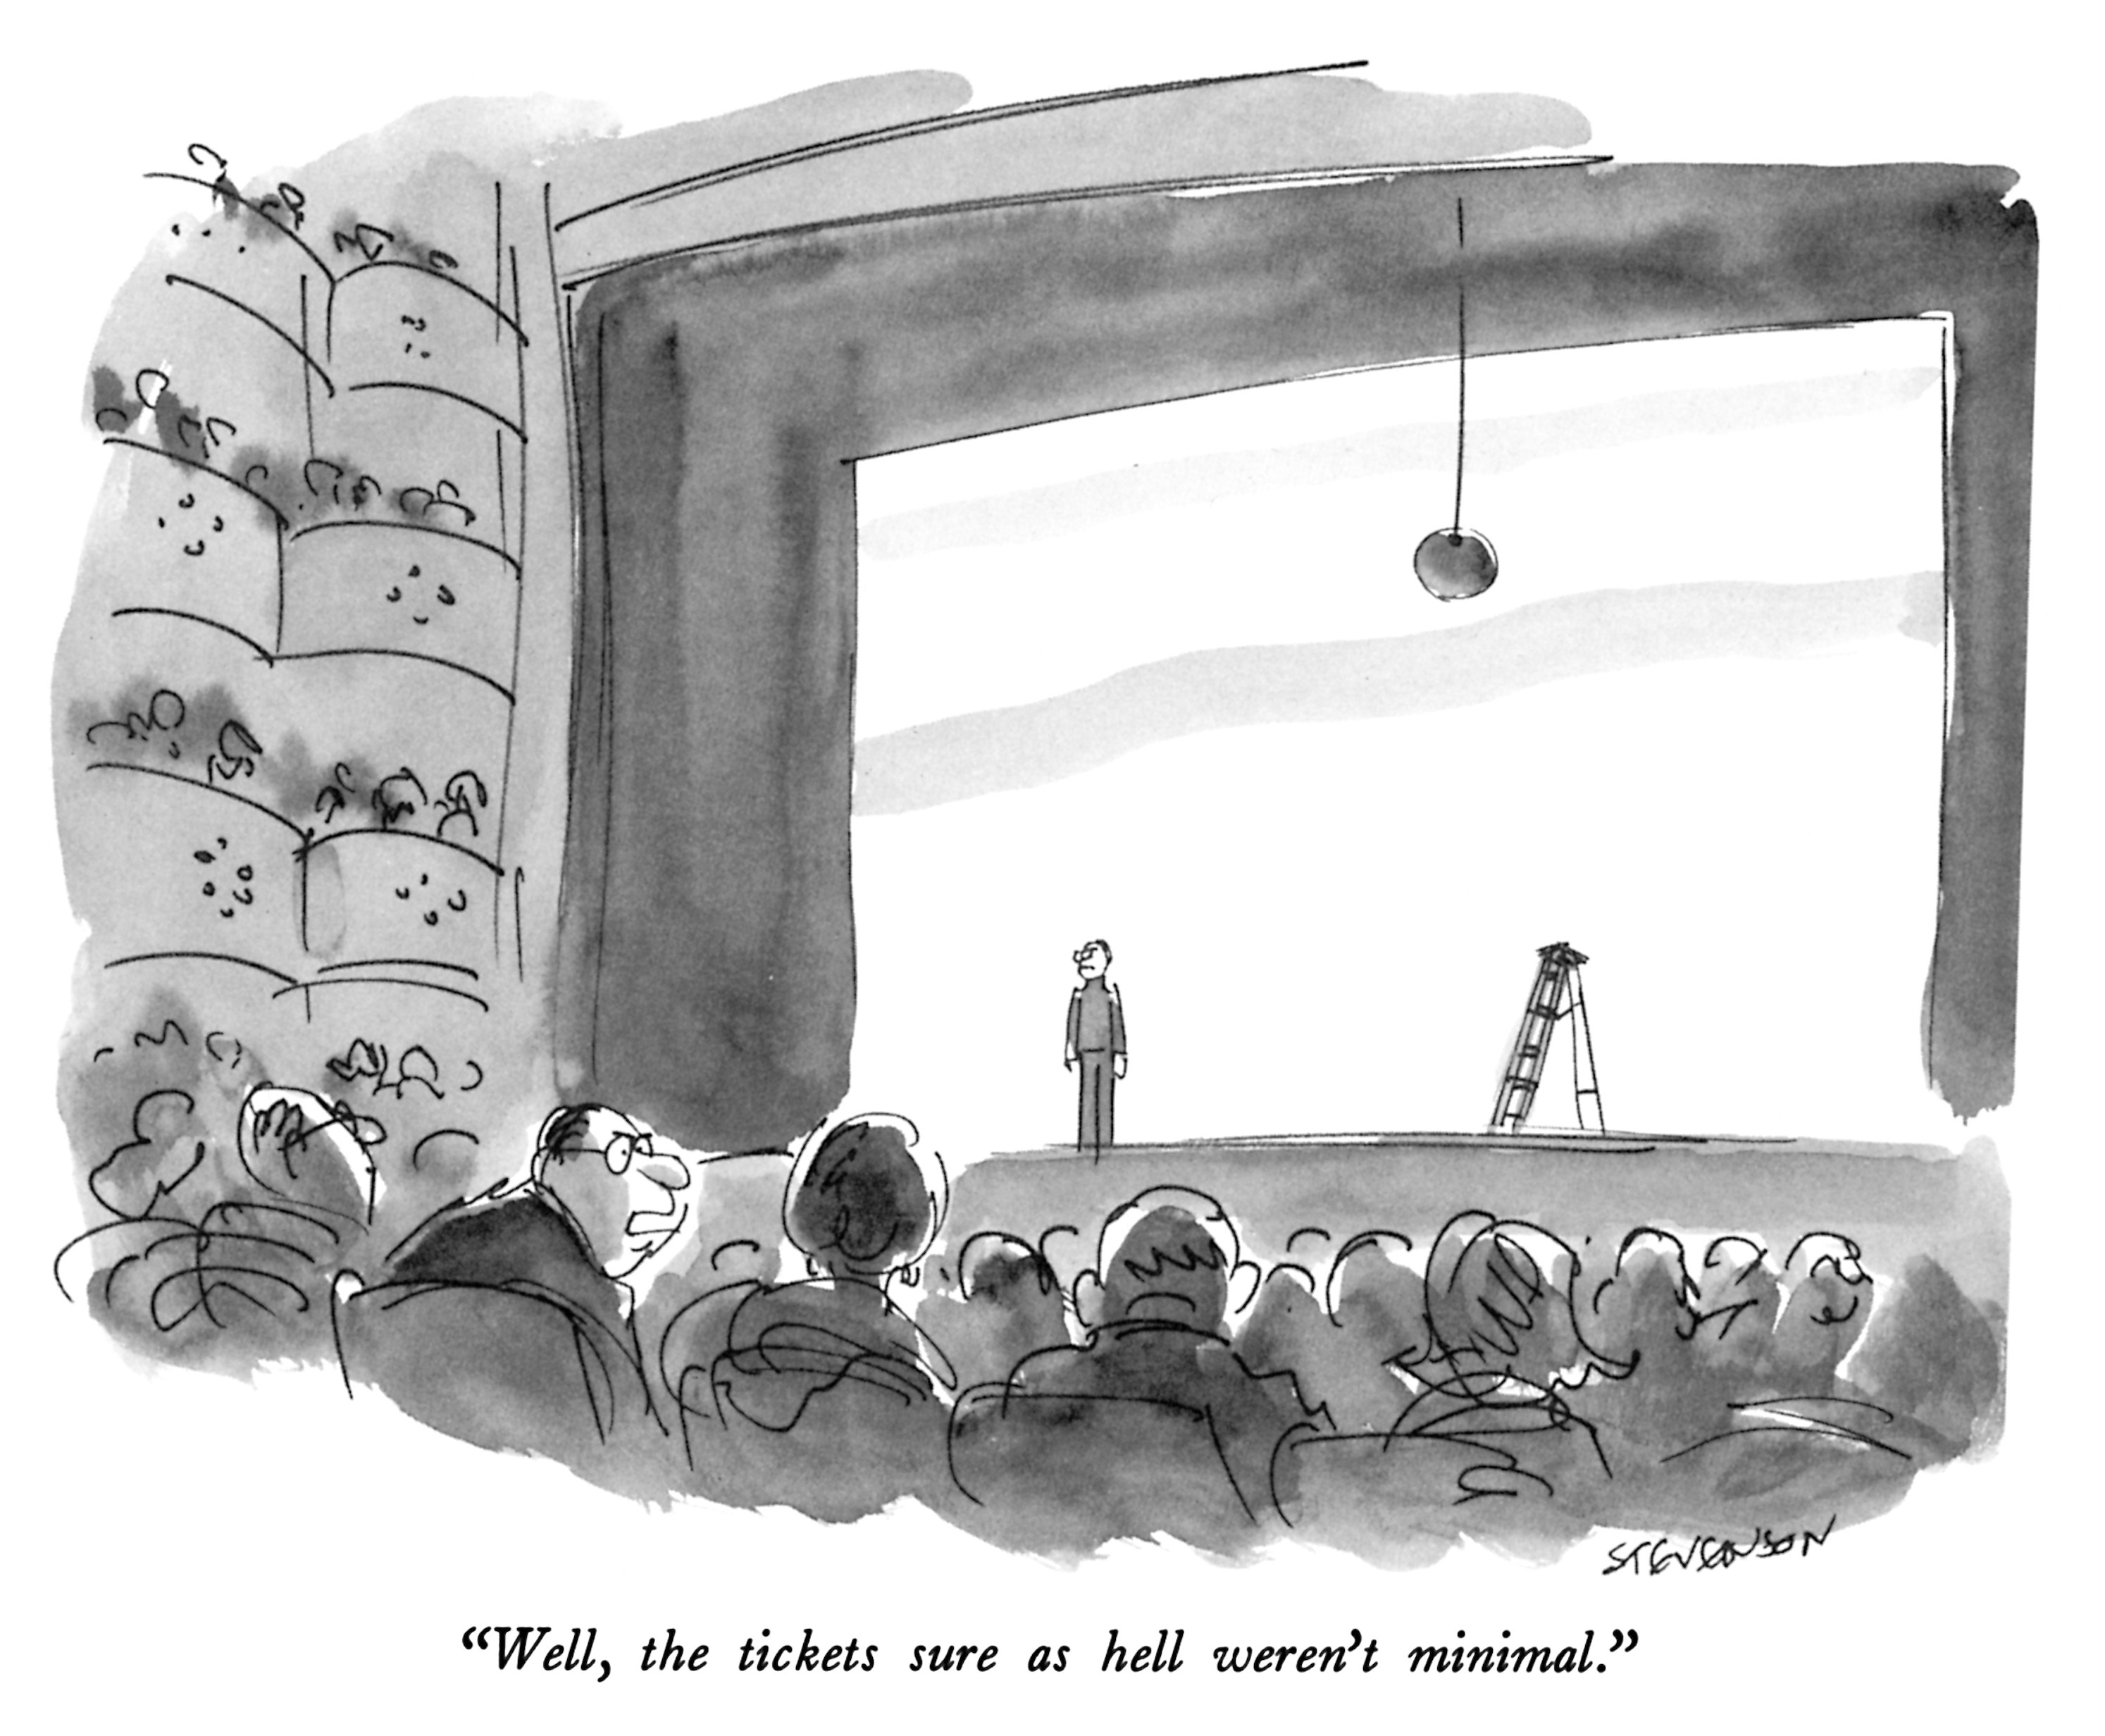 Artist:James Stevenson Credit:James Stevenson The New Yorker Collection/The Cartoon Bank